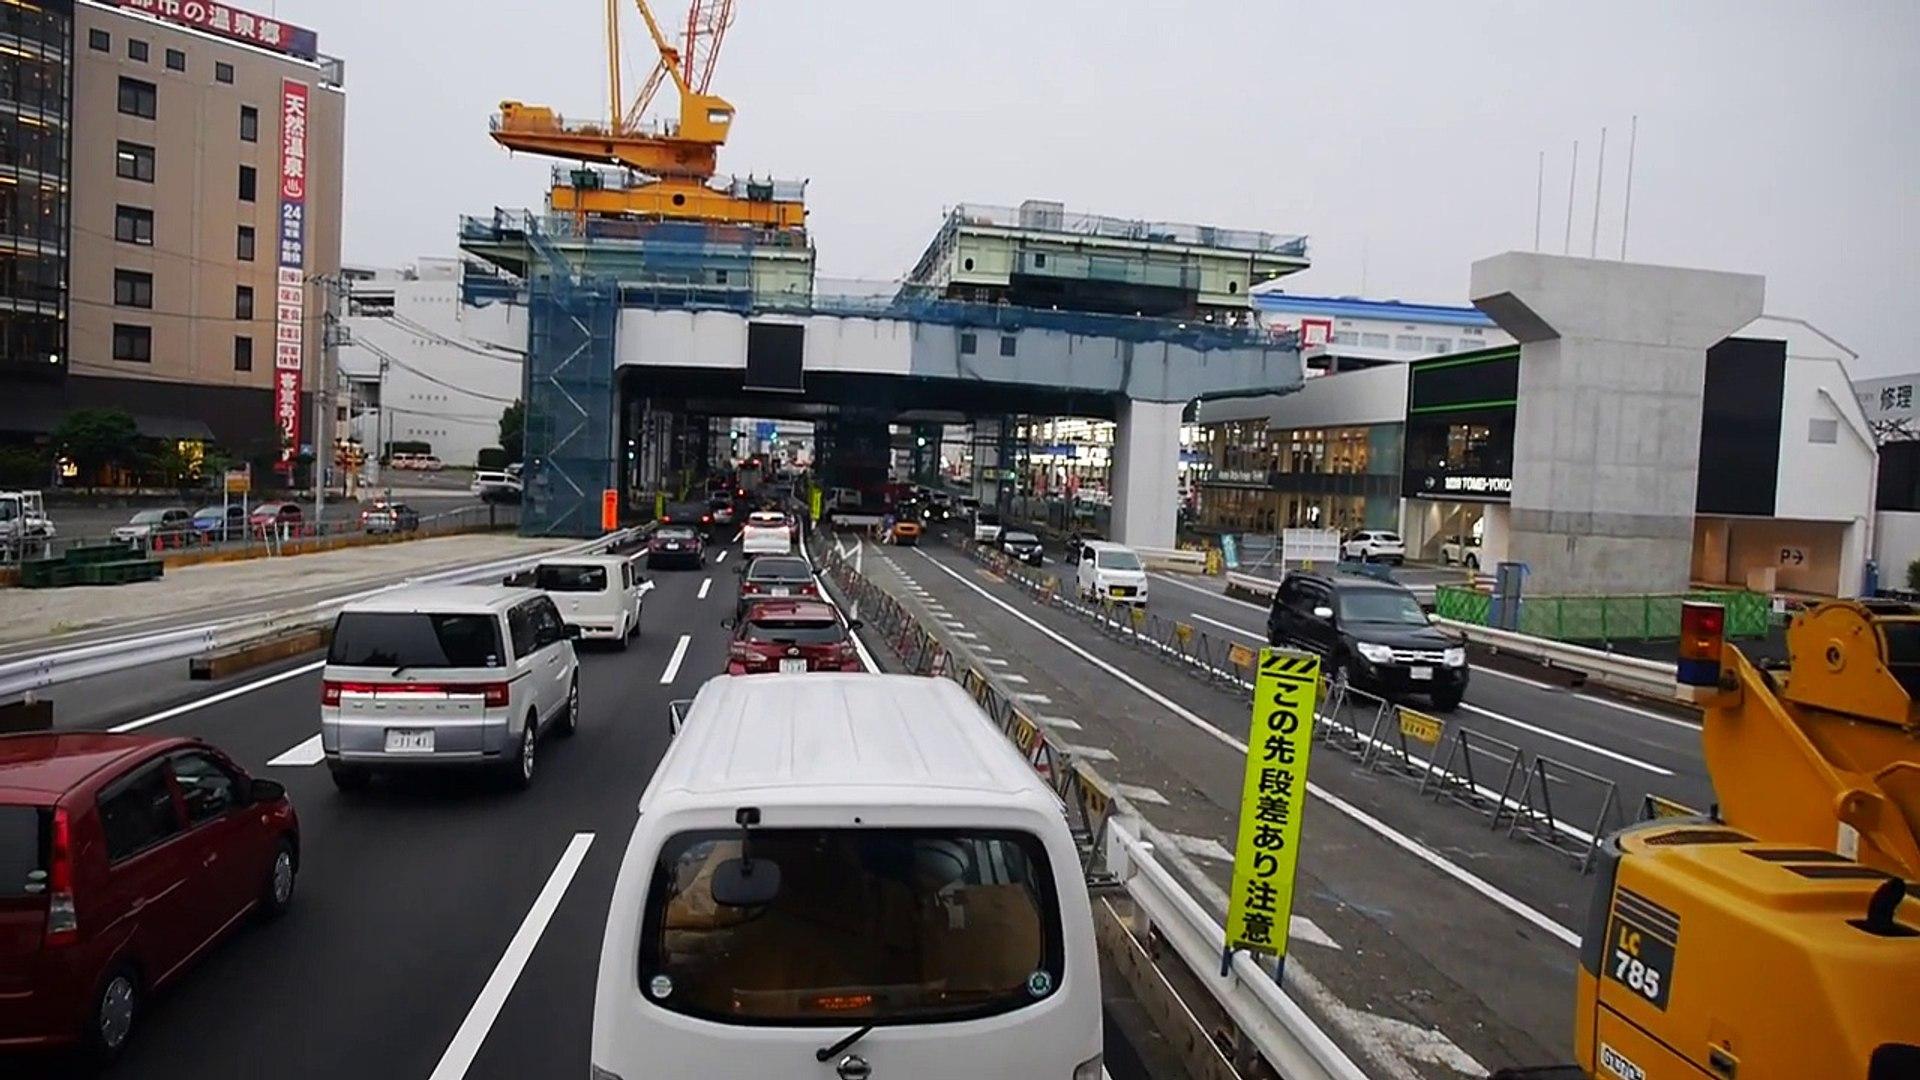 【60fps】西日本JRバス 横浜昼特急大阪2号 前面展望 足柄サービスエリア~町田バスセンター part 2/2